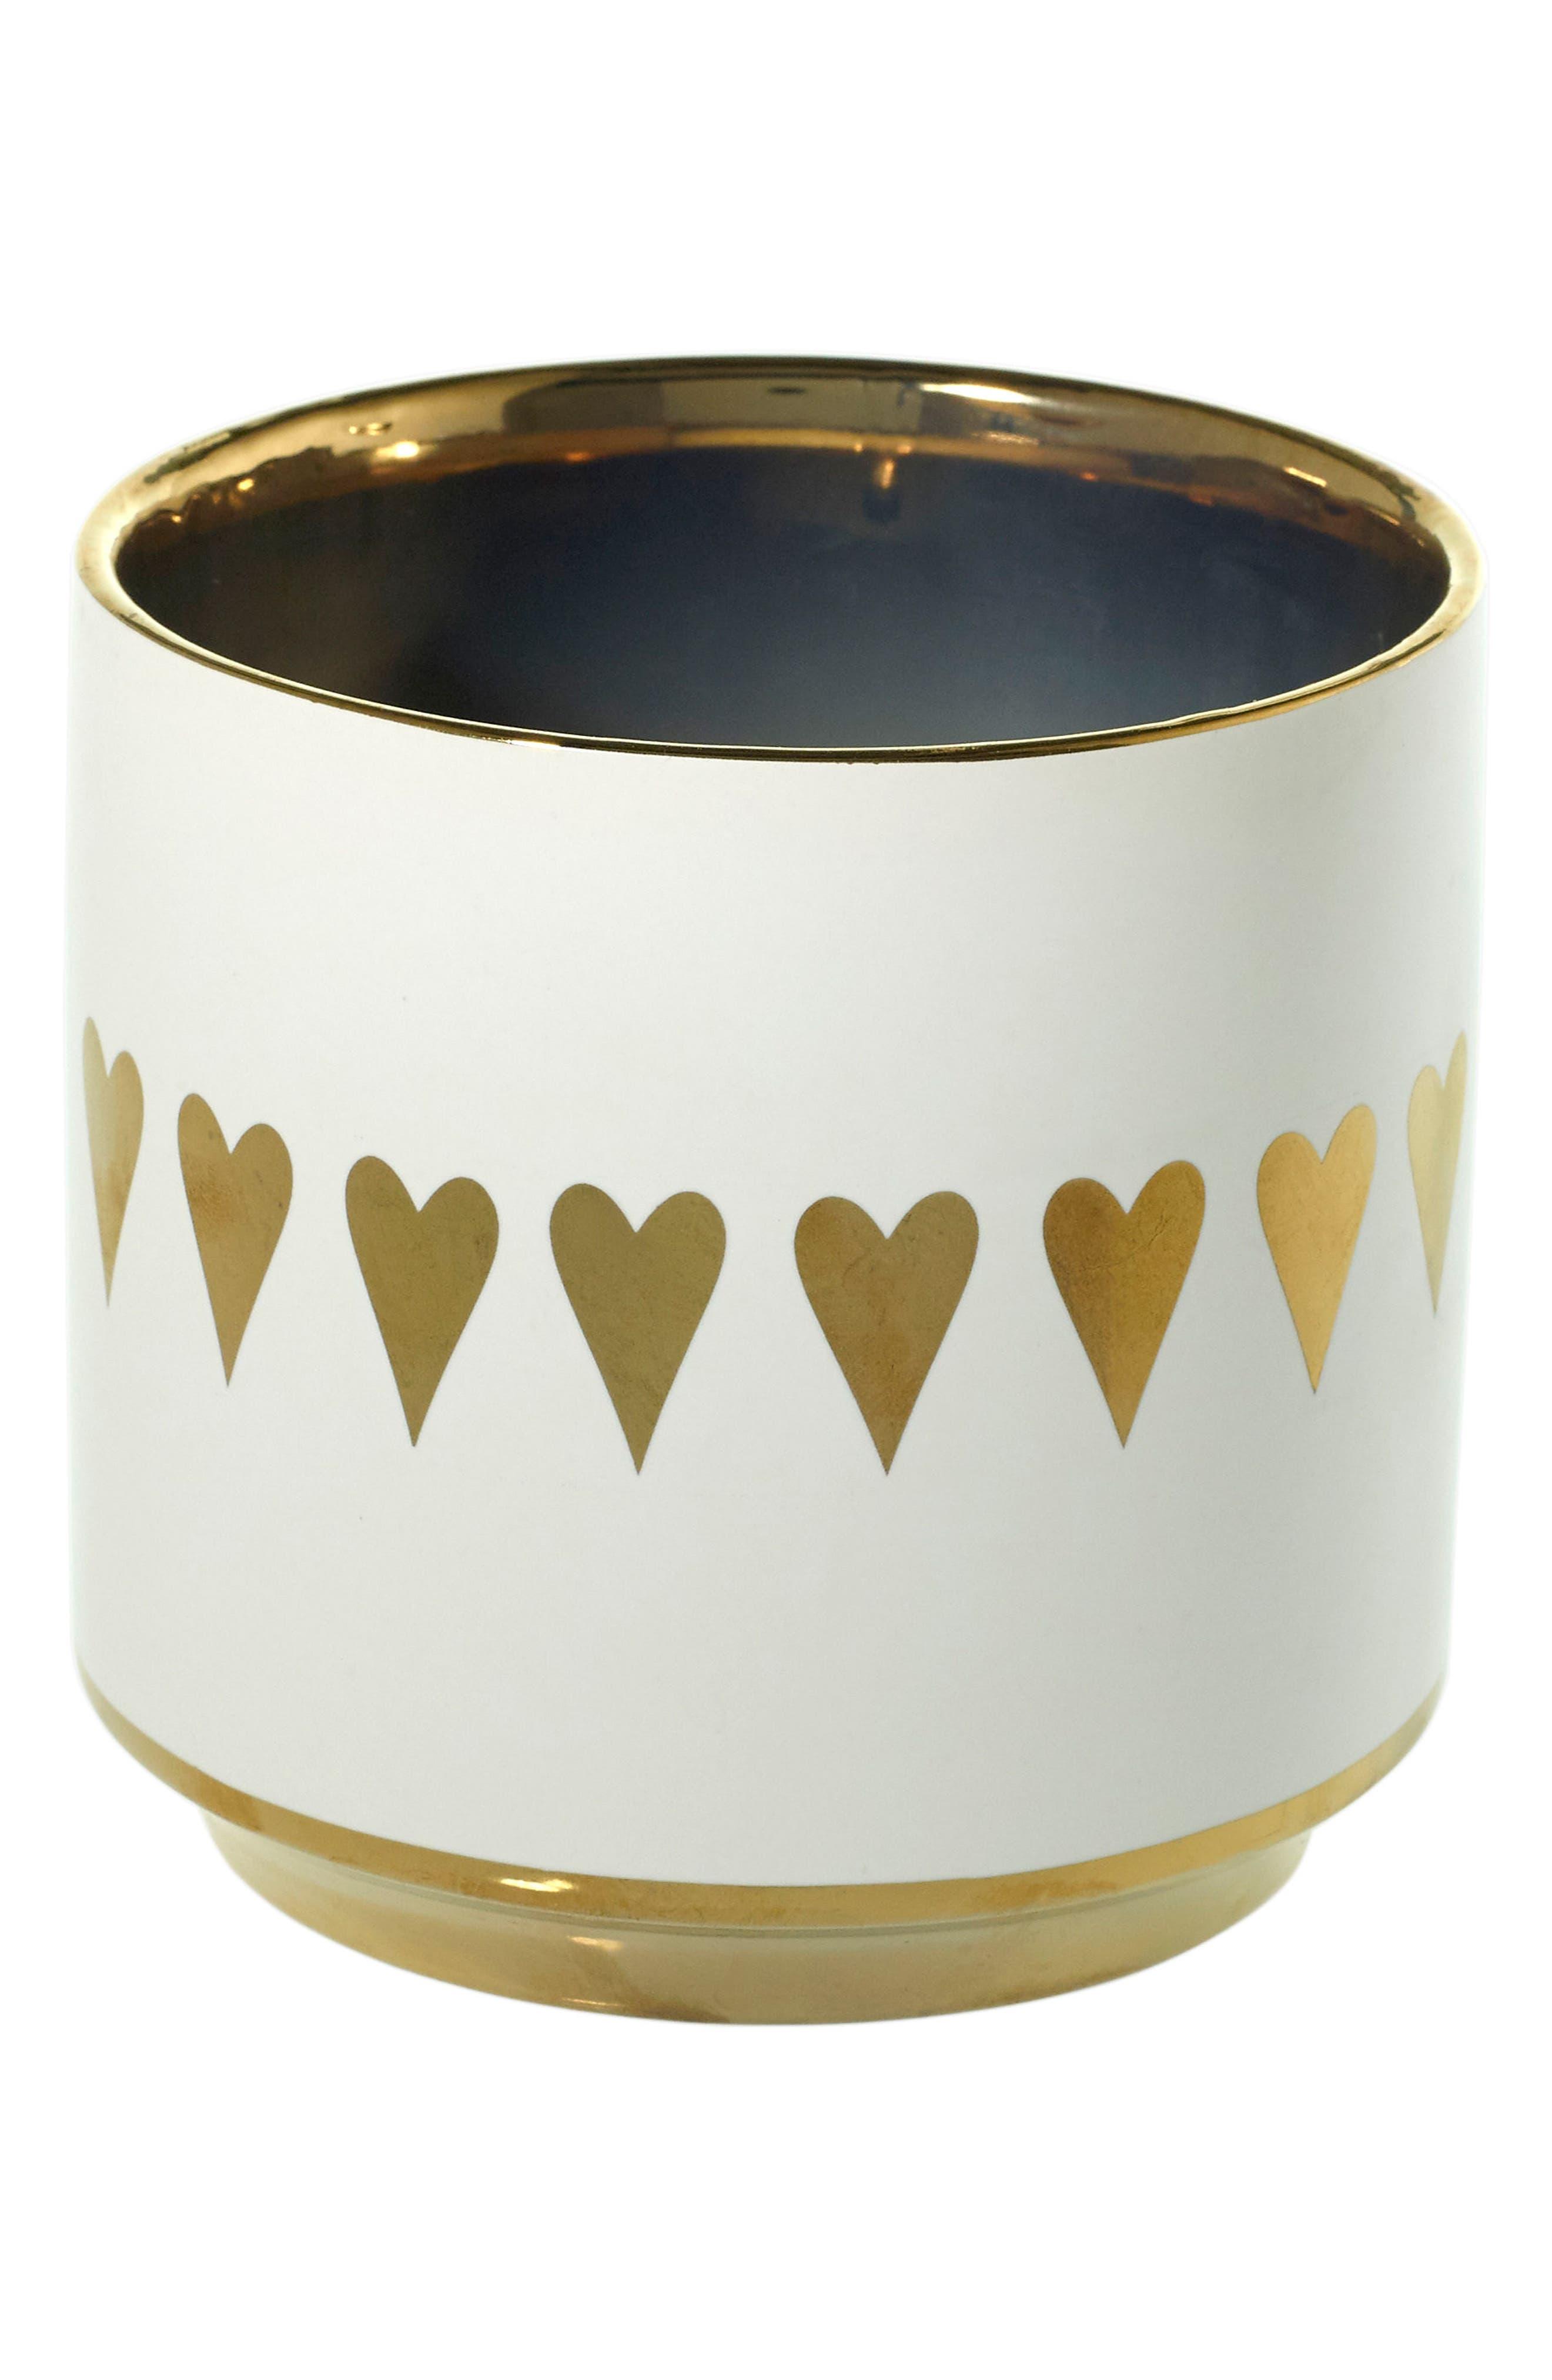 Spade Ceramic Pot,                             Main thumbnail 1, color,                             100